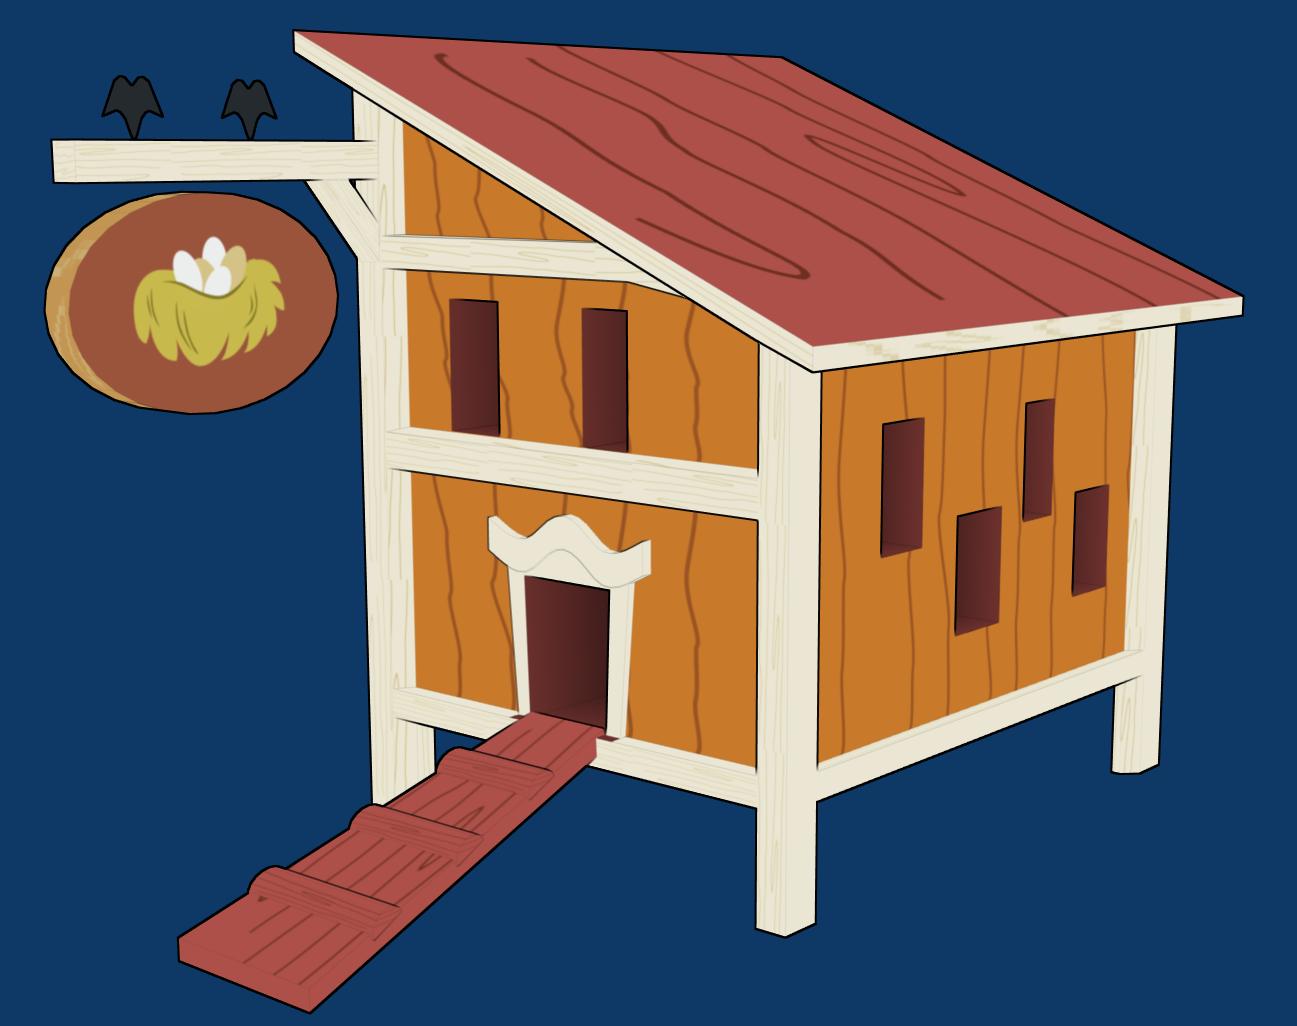 Heaven clipart house. Chicken coop clip art